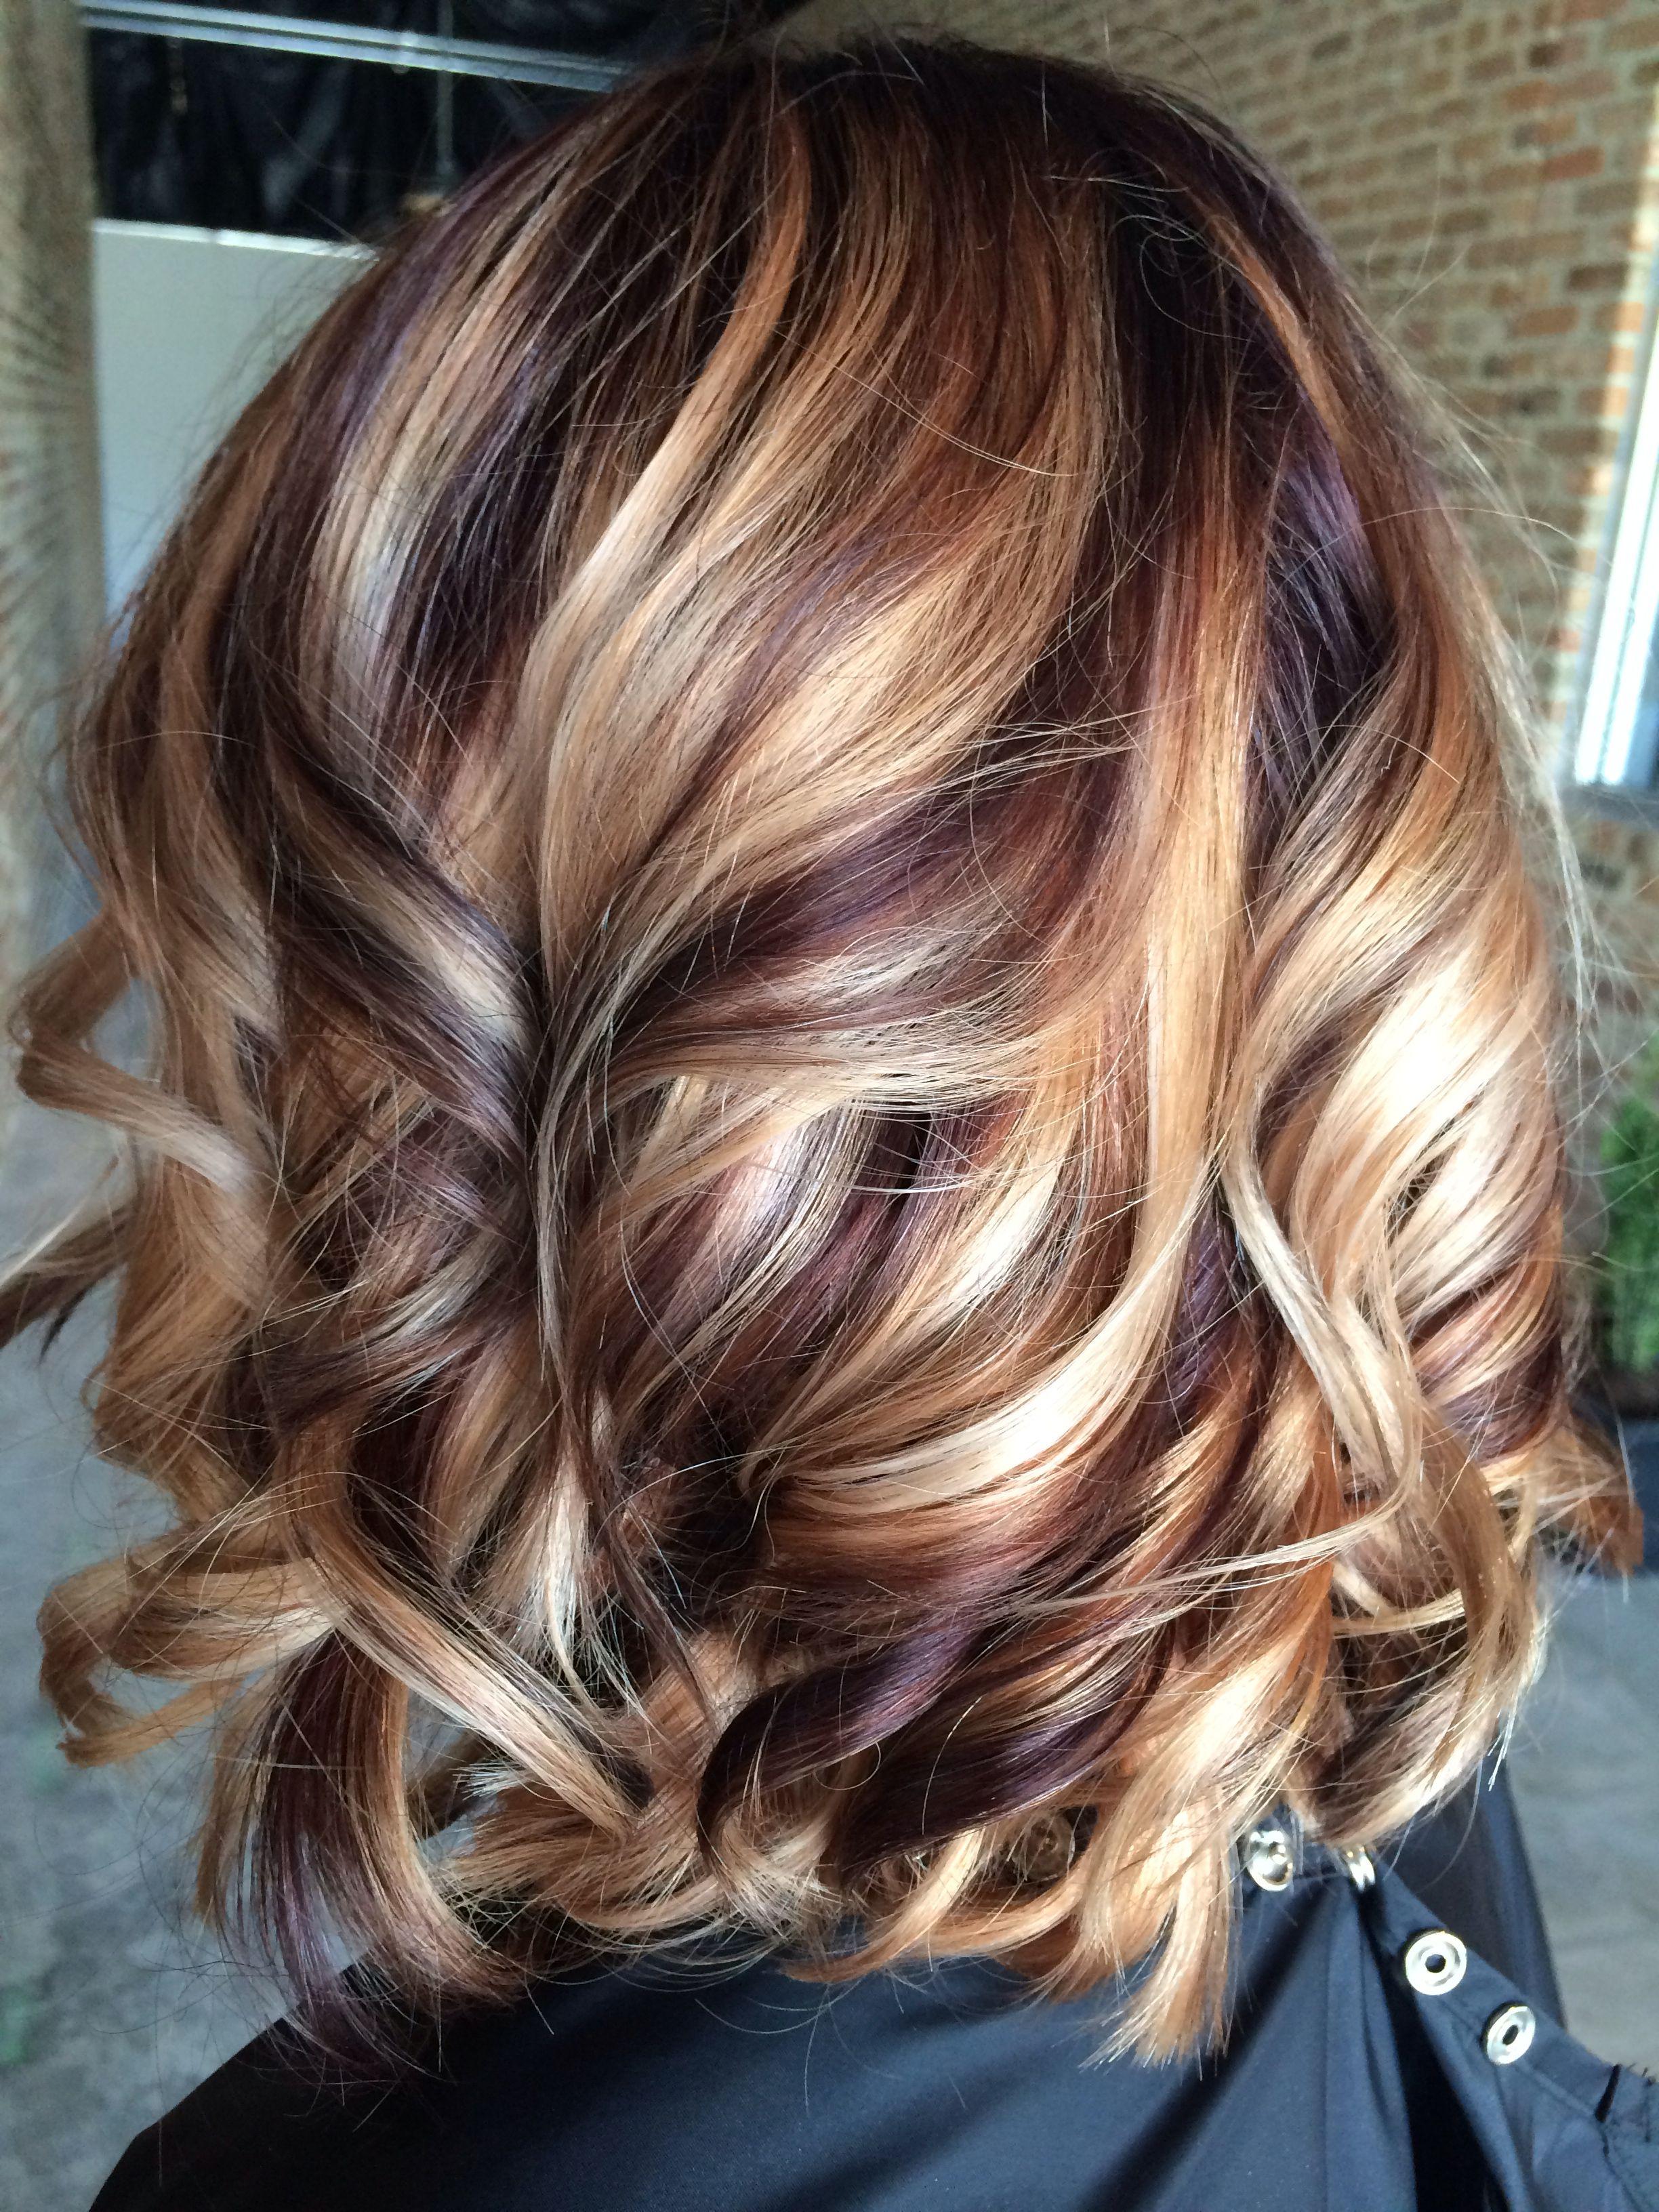 10 Awesome Long Haircut And Color Ideas 15 pretty hairstyles for medium length hair my style hair hair 2020